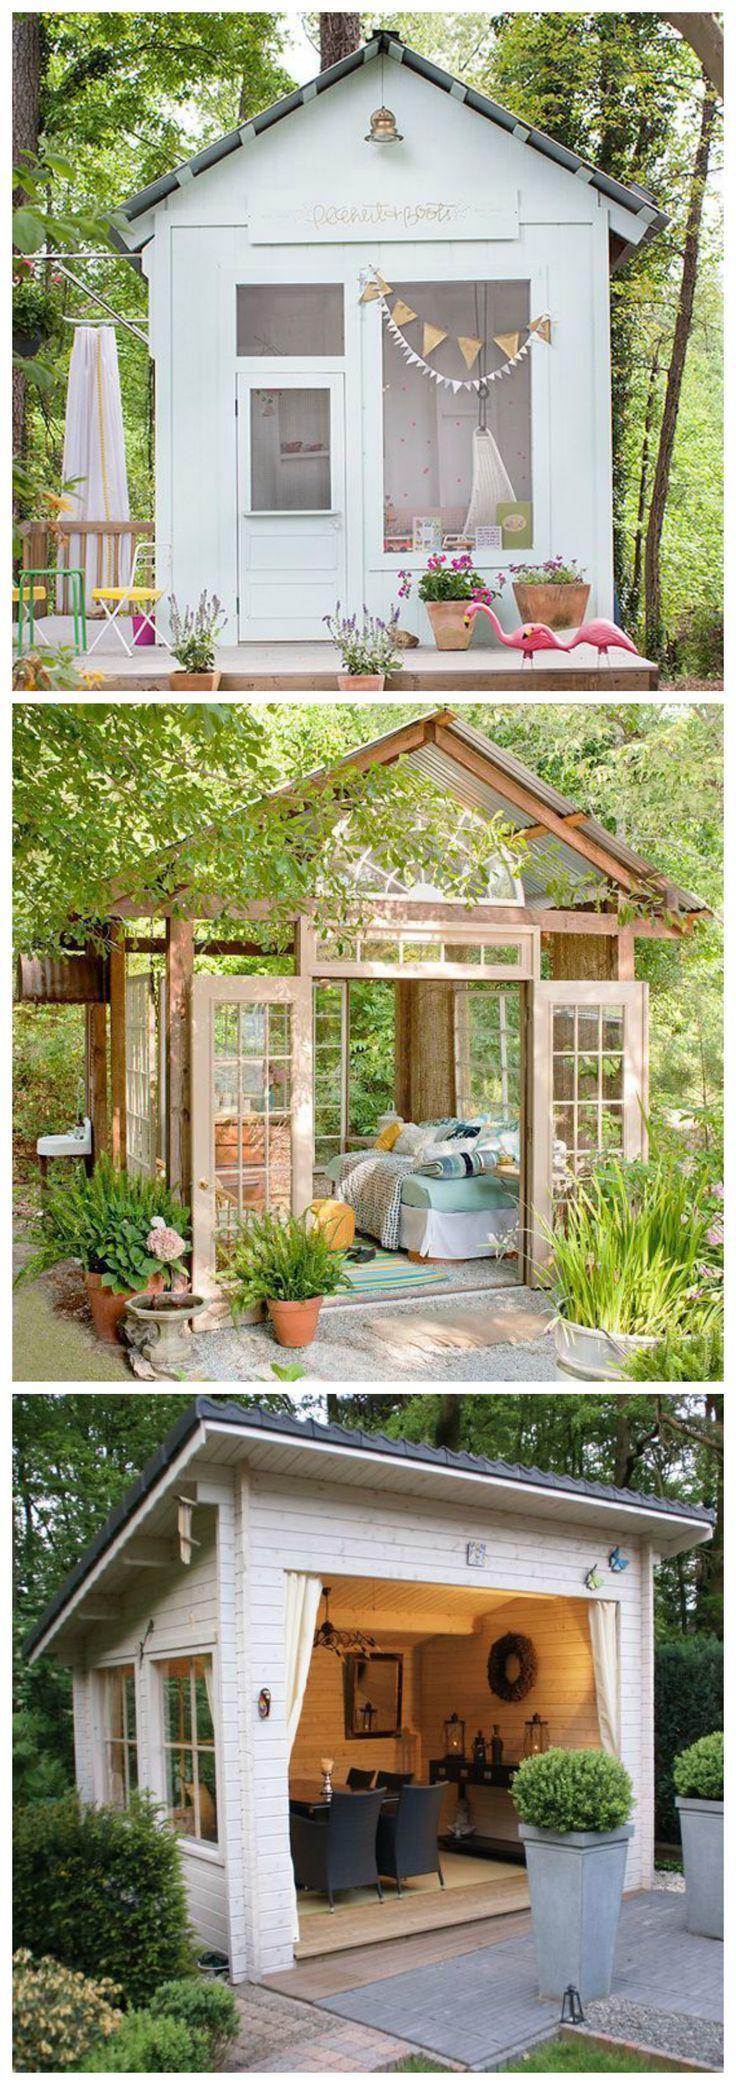 "Incredible Wood Backyard Pavilion Design Ideas Outdoor 1: Stylish ""She Sheds""-8 Incredible Backyard Ideas"